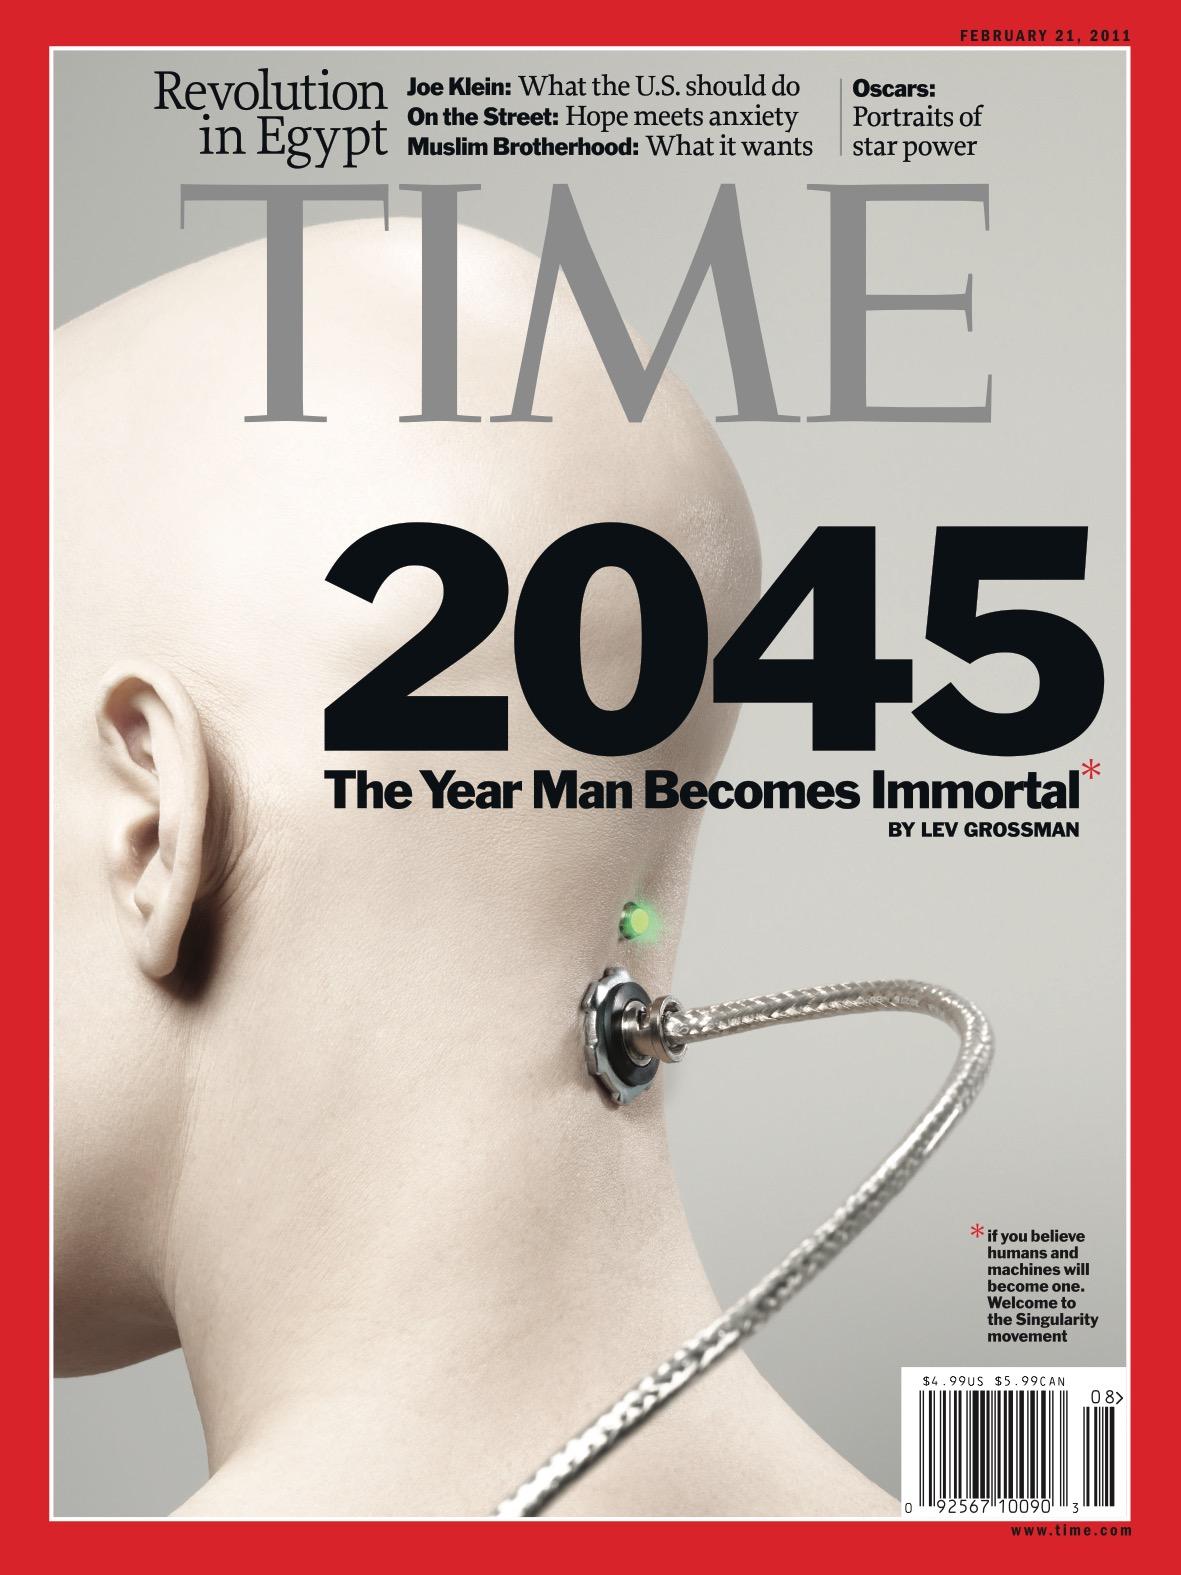 TIME_20110221_CV1_517933_C1.jpeg